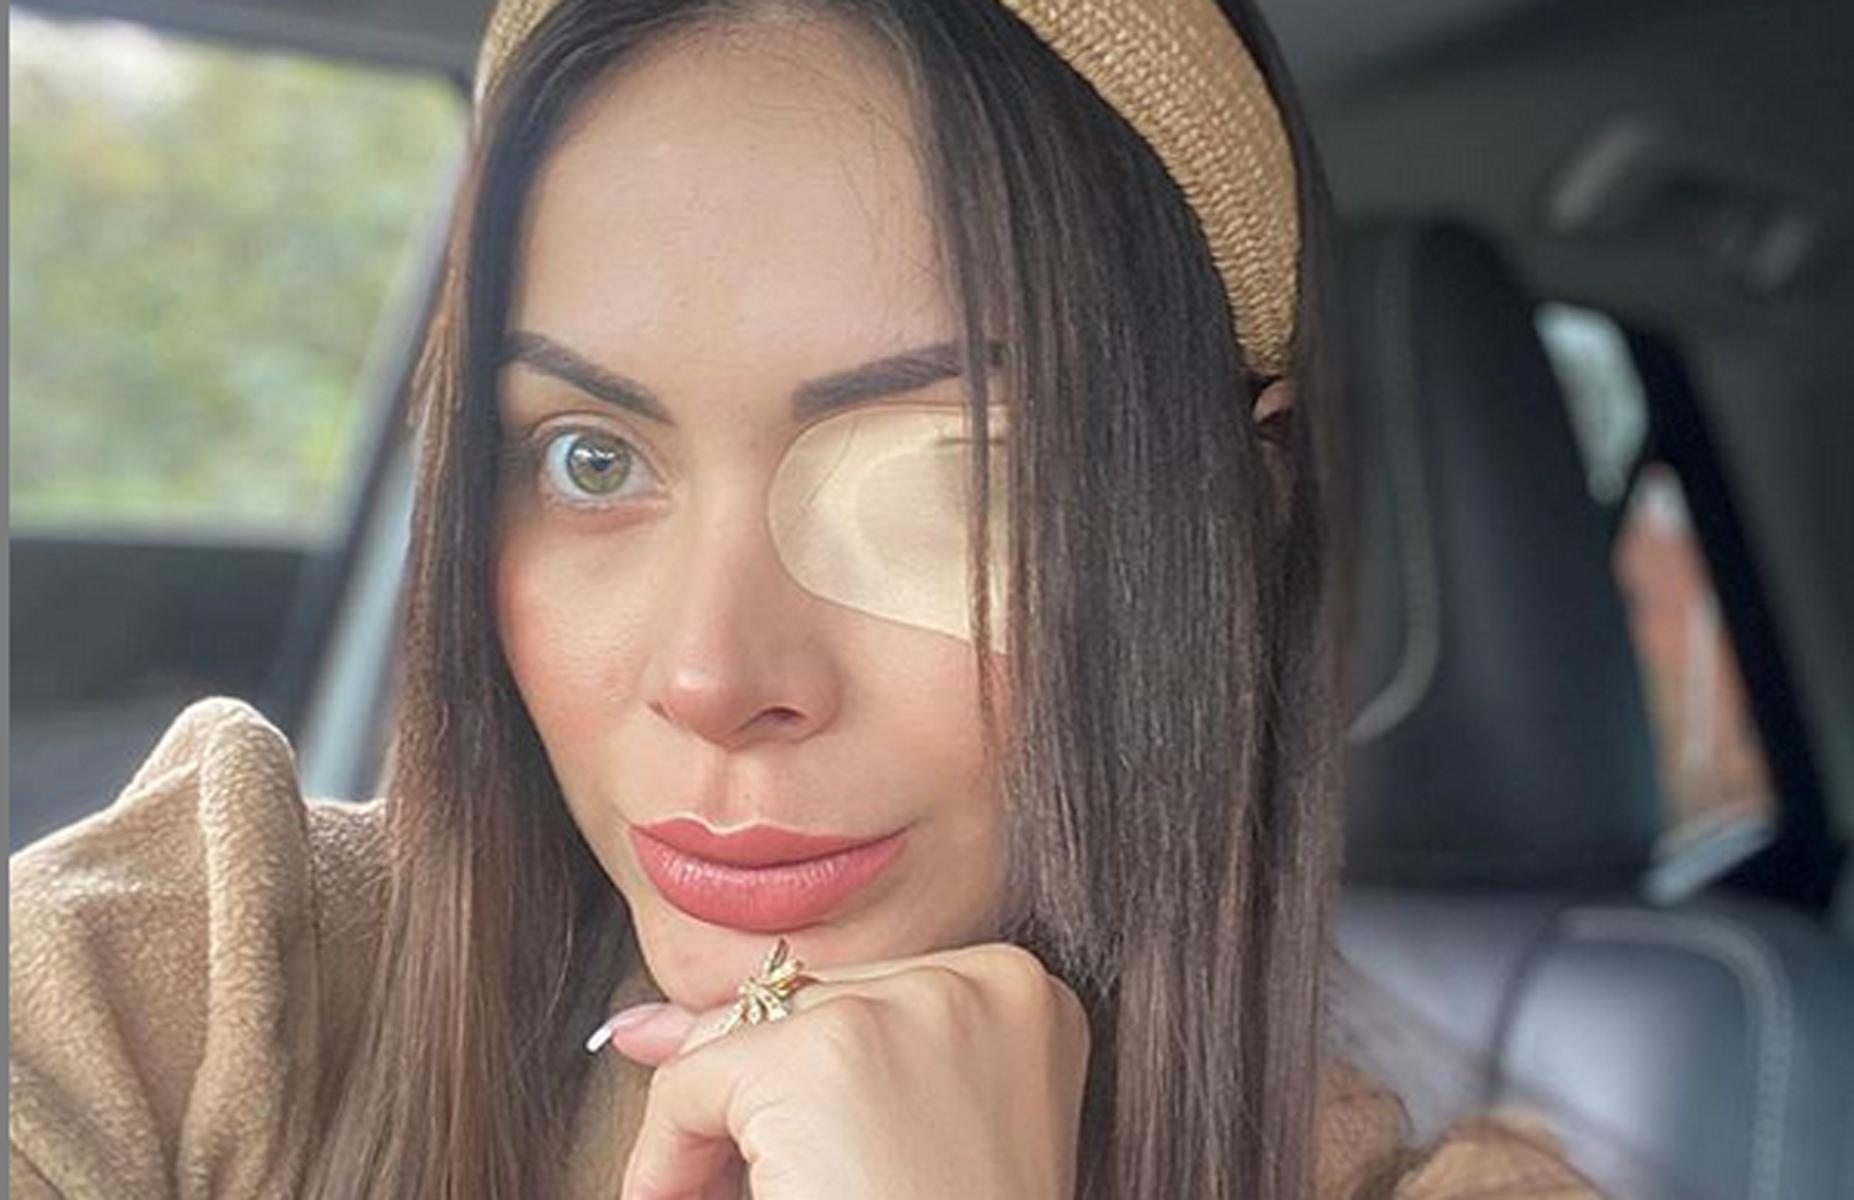 Laura Gónzalez Modelo Colombiana córnea